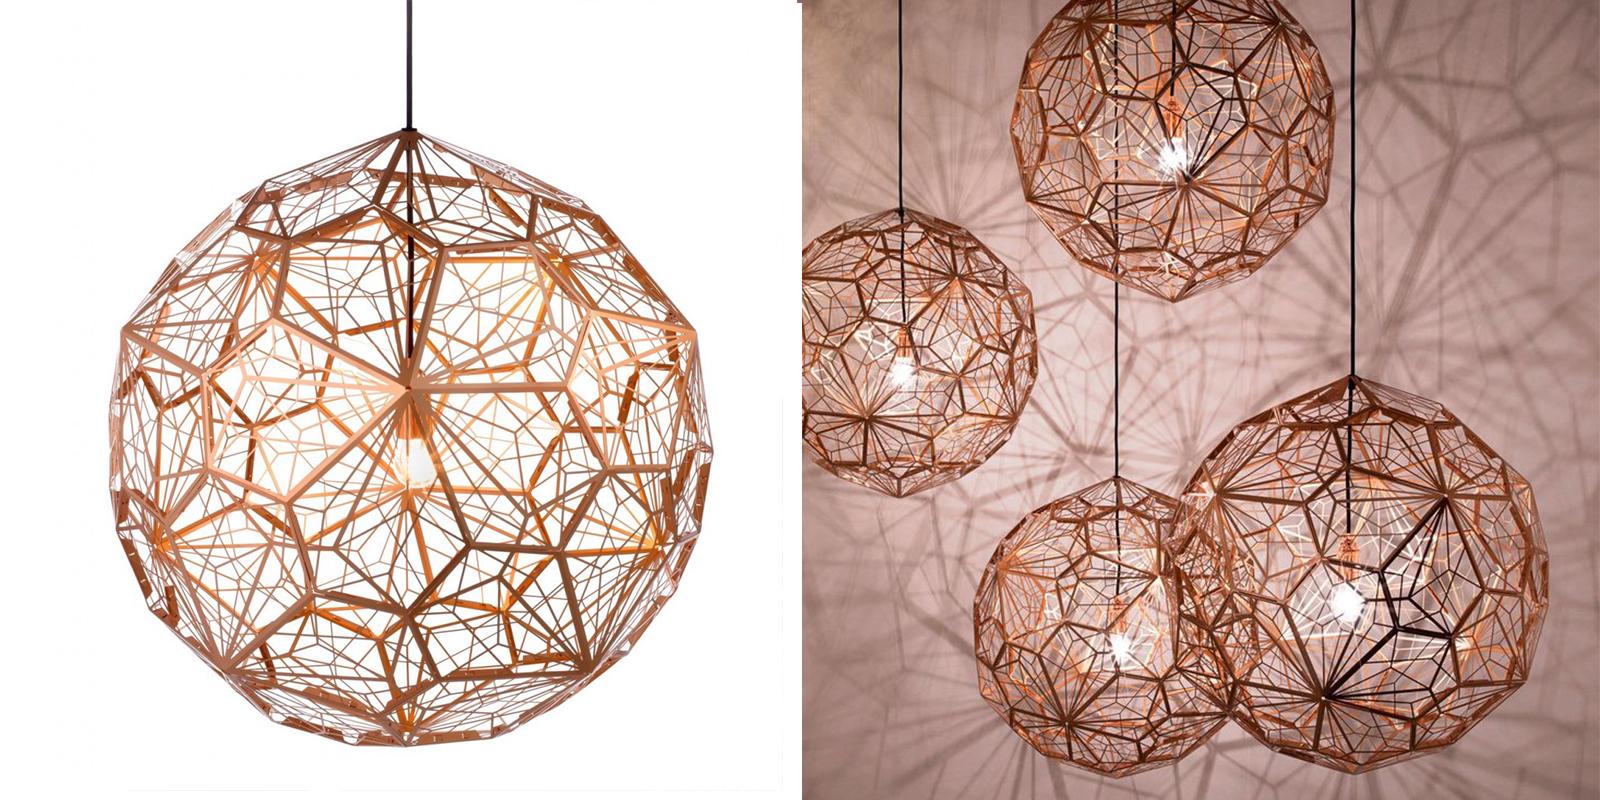 OCT Industrial Diamond Ball Light Fixture